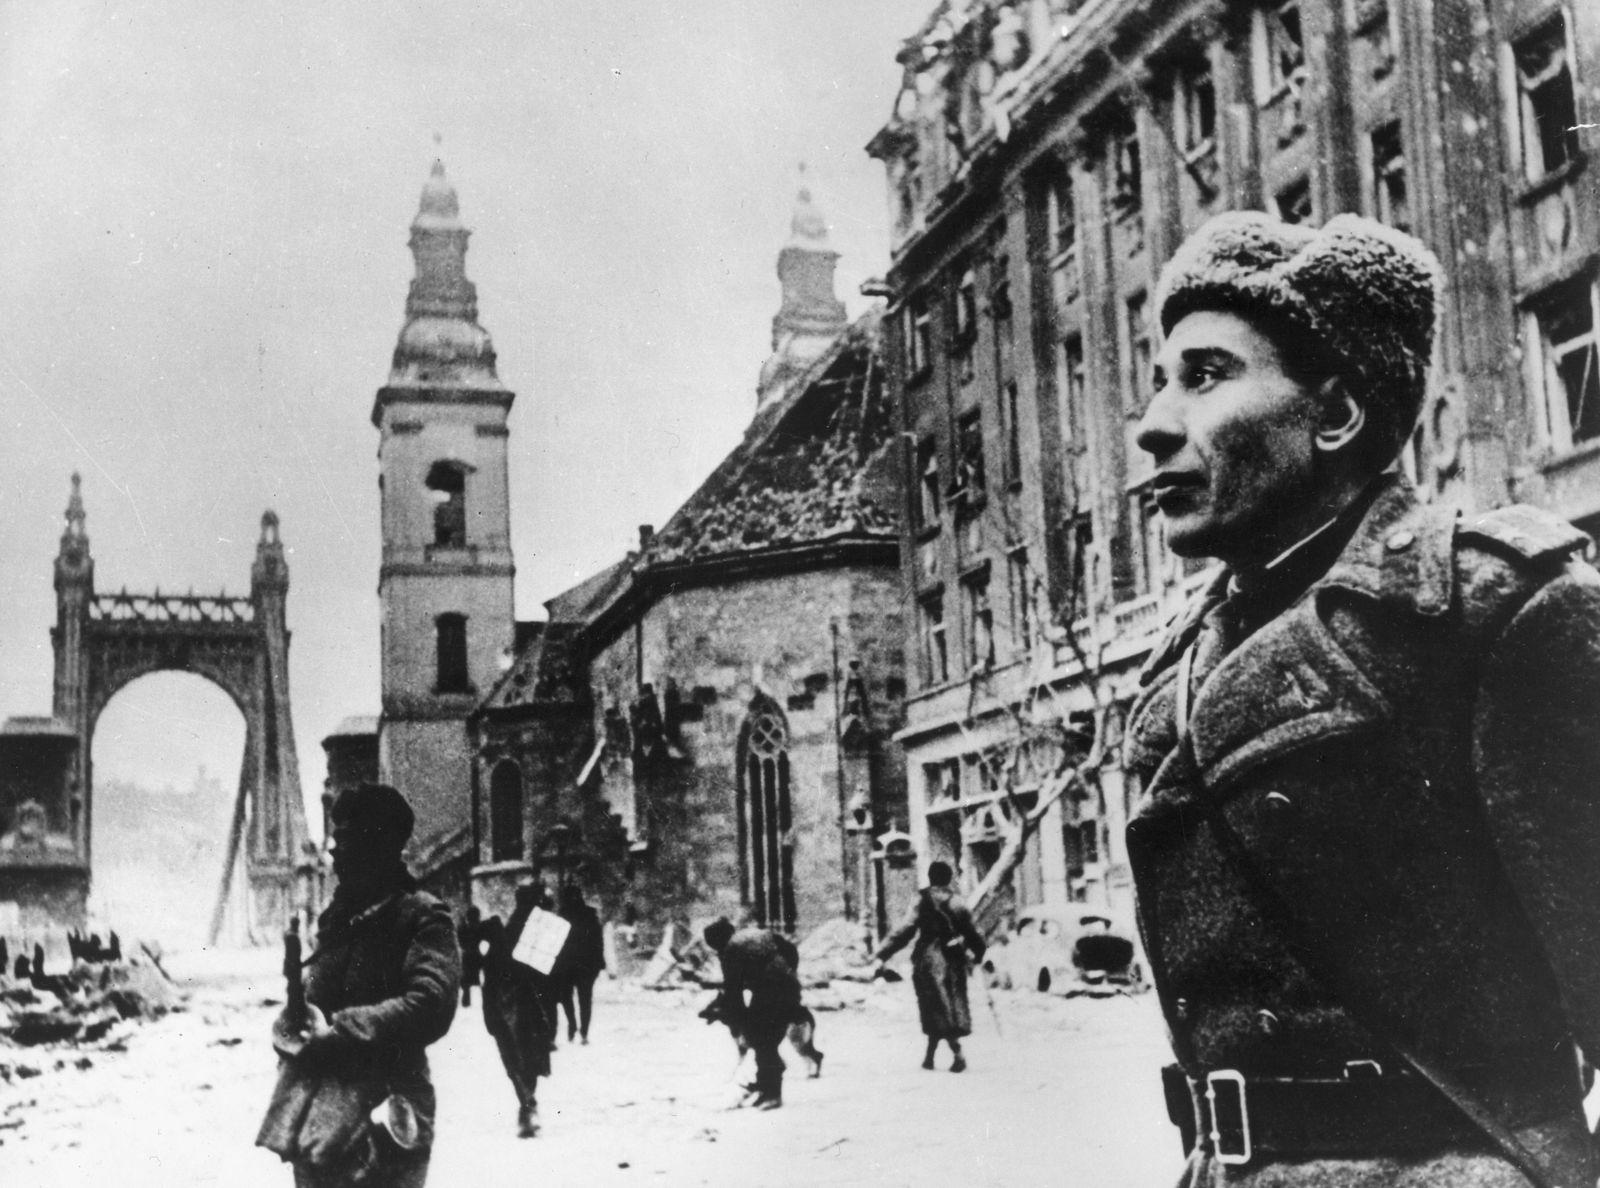 Budapest / 2. Weltkrieg / WK II